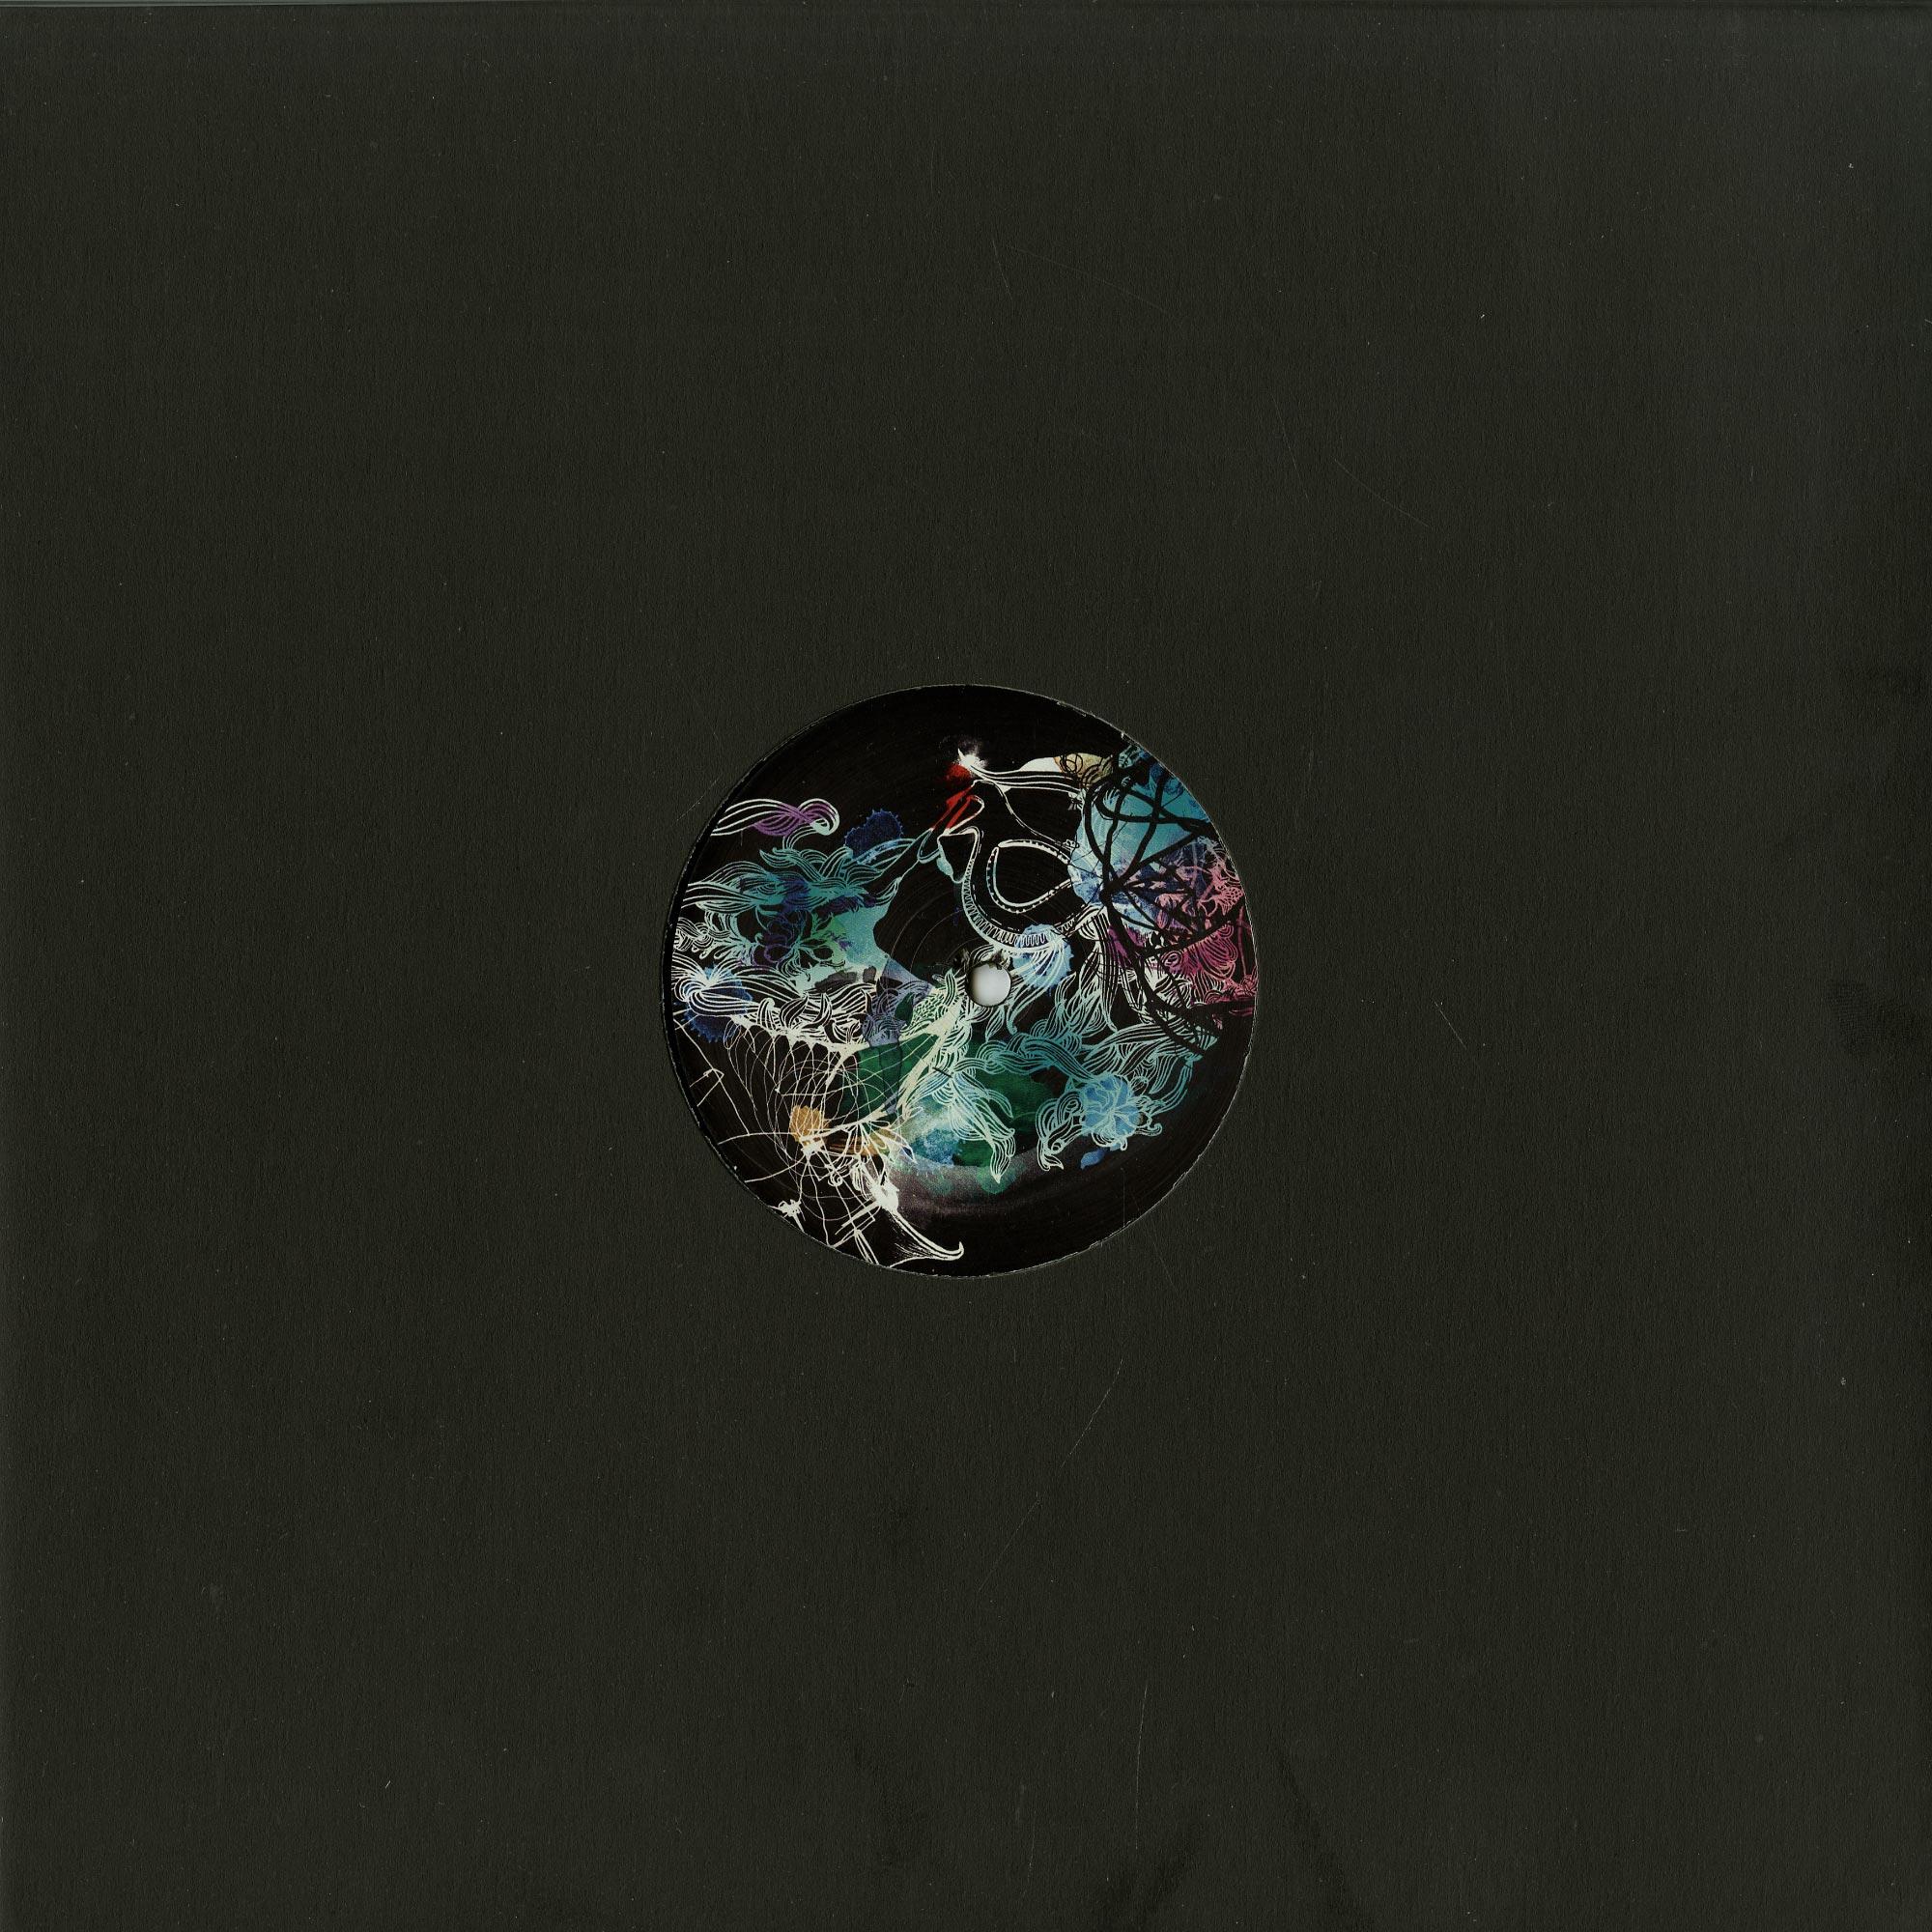 Sam Paganini - BLACK LEATHER EP PT2